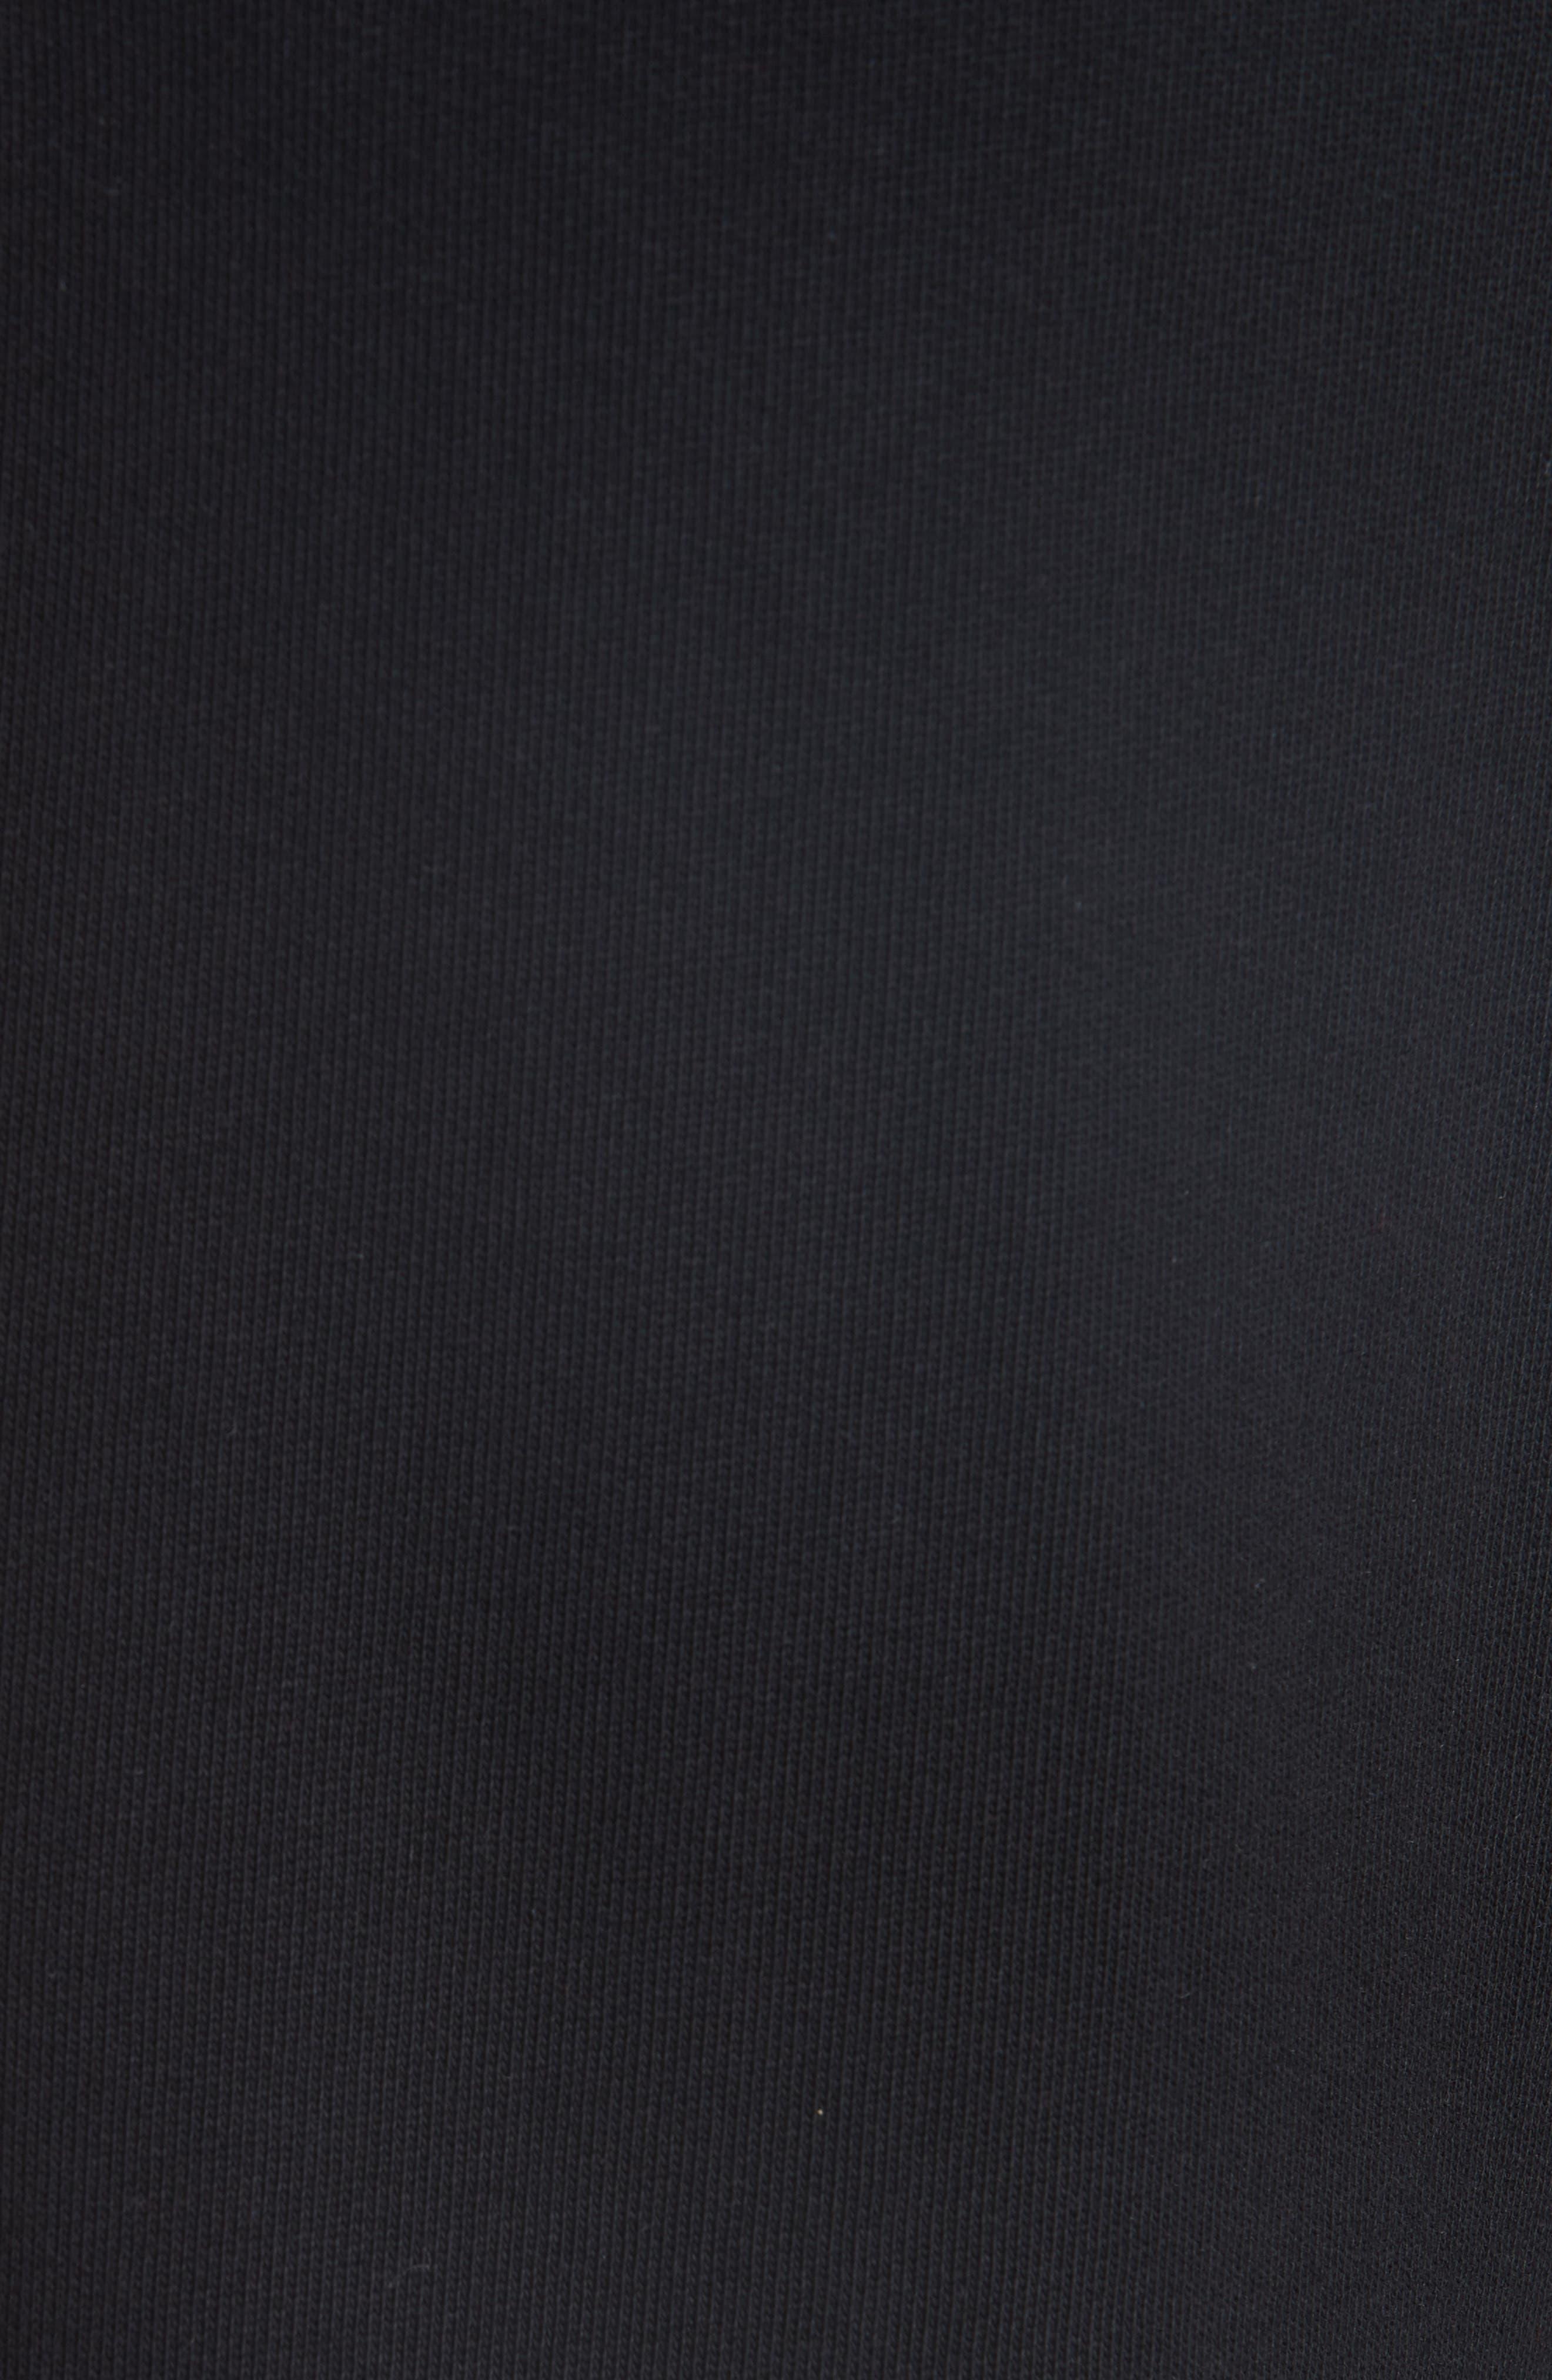 Knit Bermuda Shorts,                             Alternate thumbnail 5, color,                             001